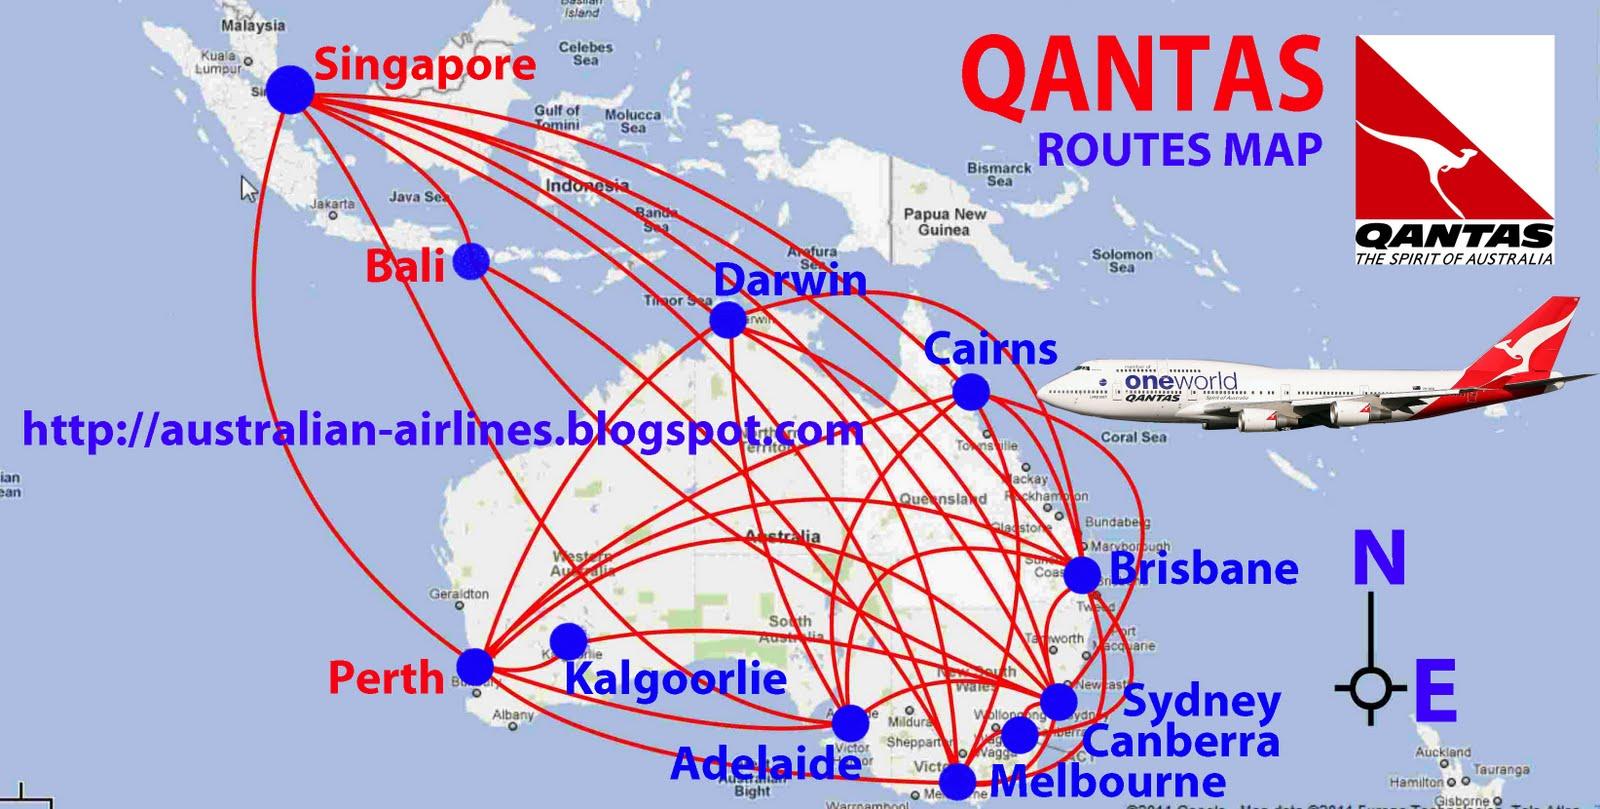 Qantas Route Map Qantas routes map | Design Plane Qantas Route Map